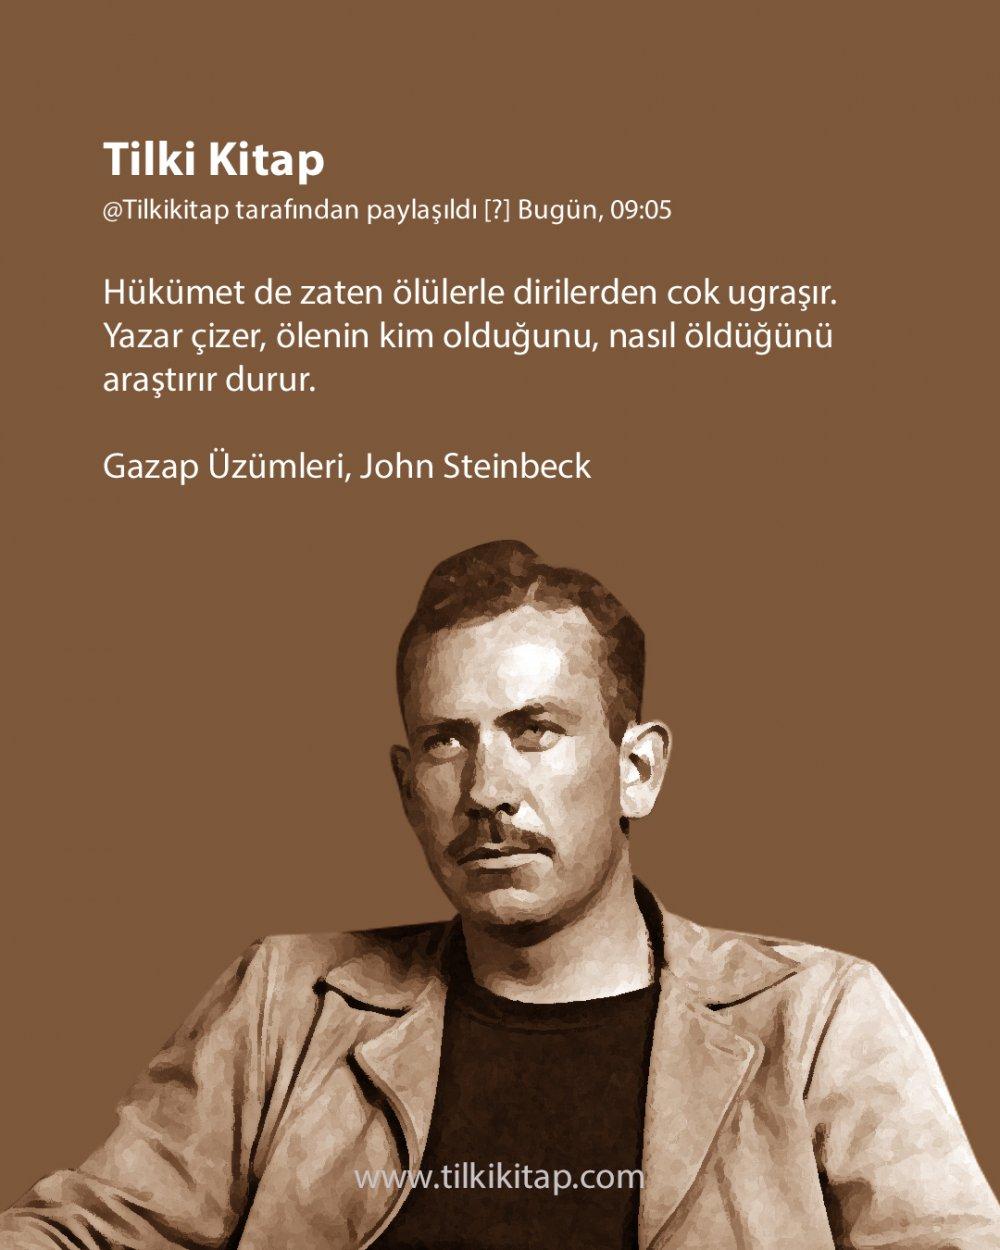 Gazap Üzümleri, John Steinbeck, John Steinbeck Kitapları, John Steinbeck Alıntı, John Steinbeck Sözleri, John Steinbeck Gazap Üzümleri, John Steinbeck